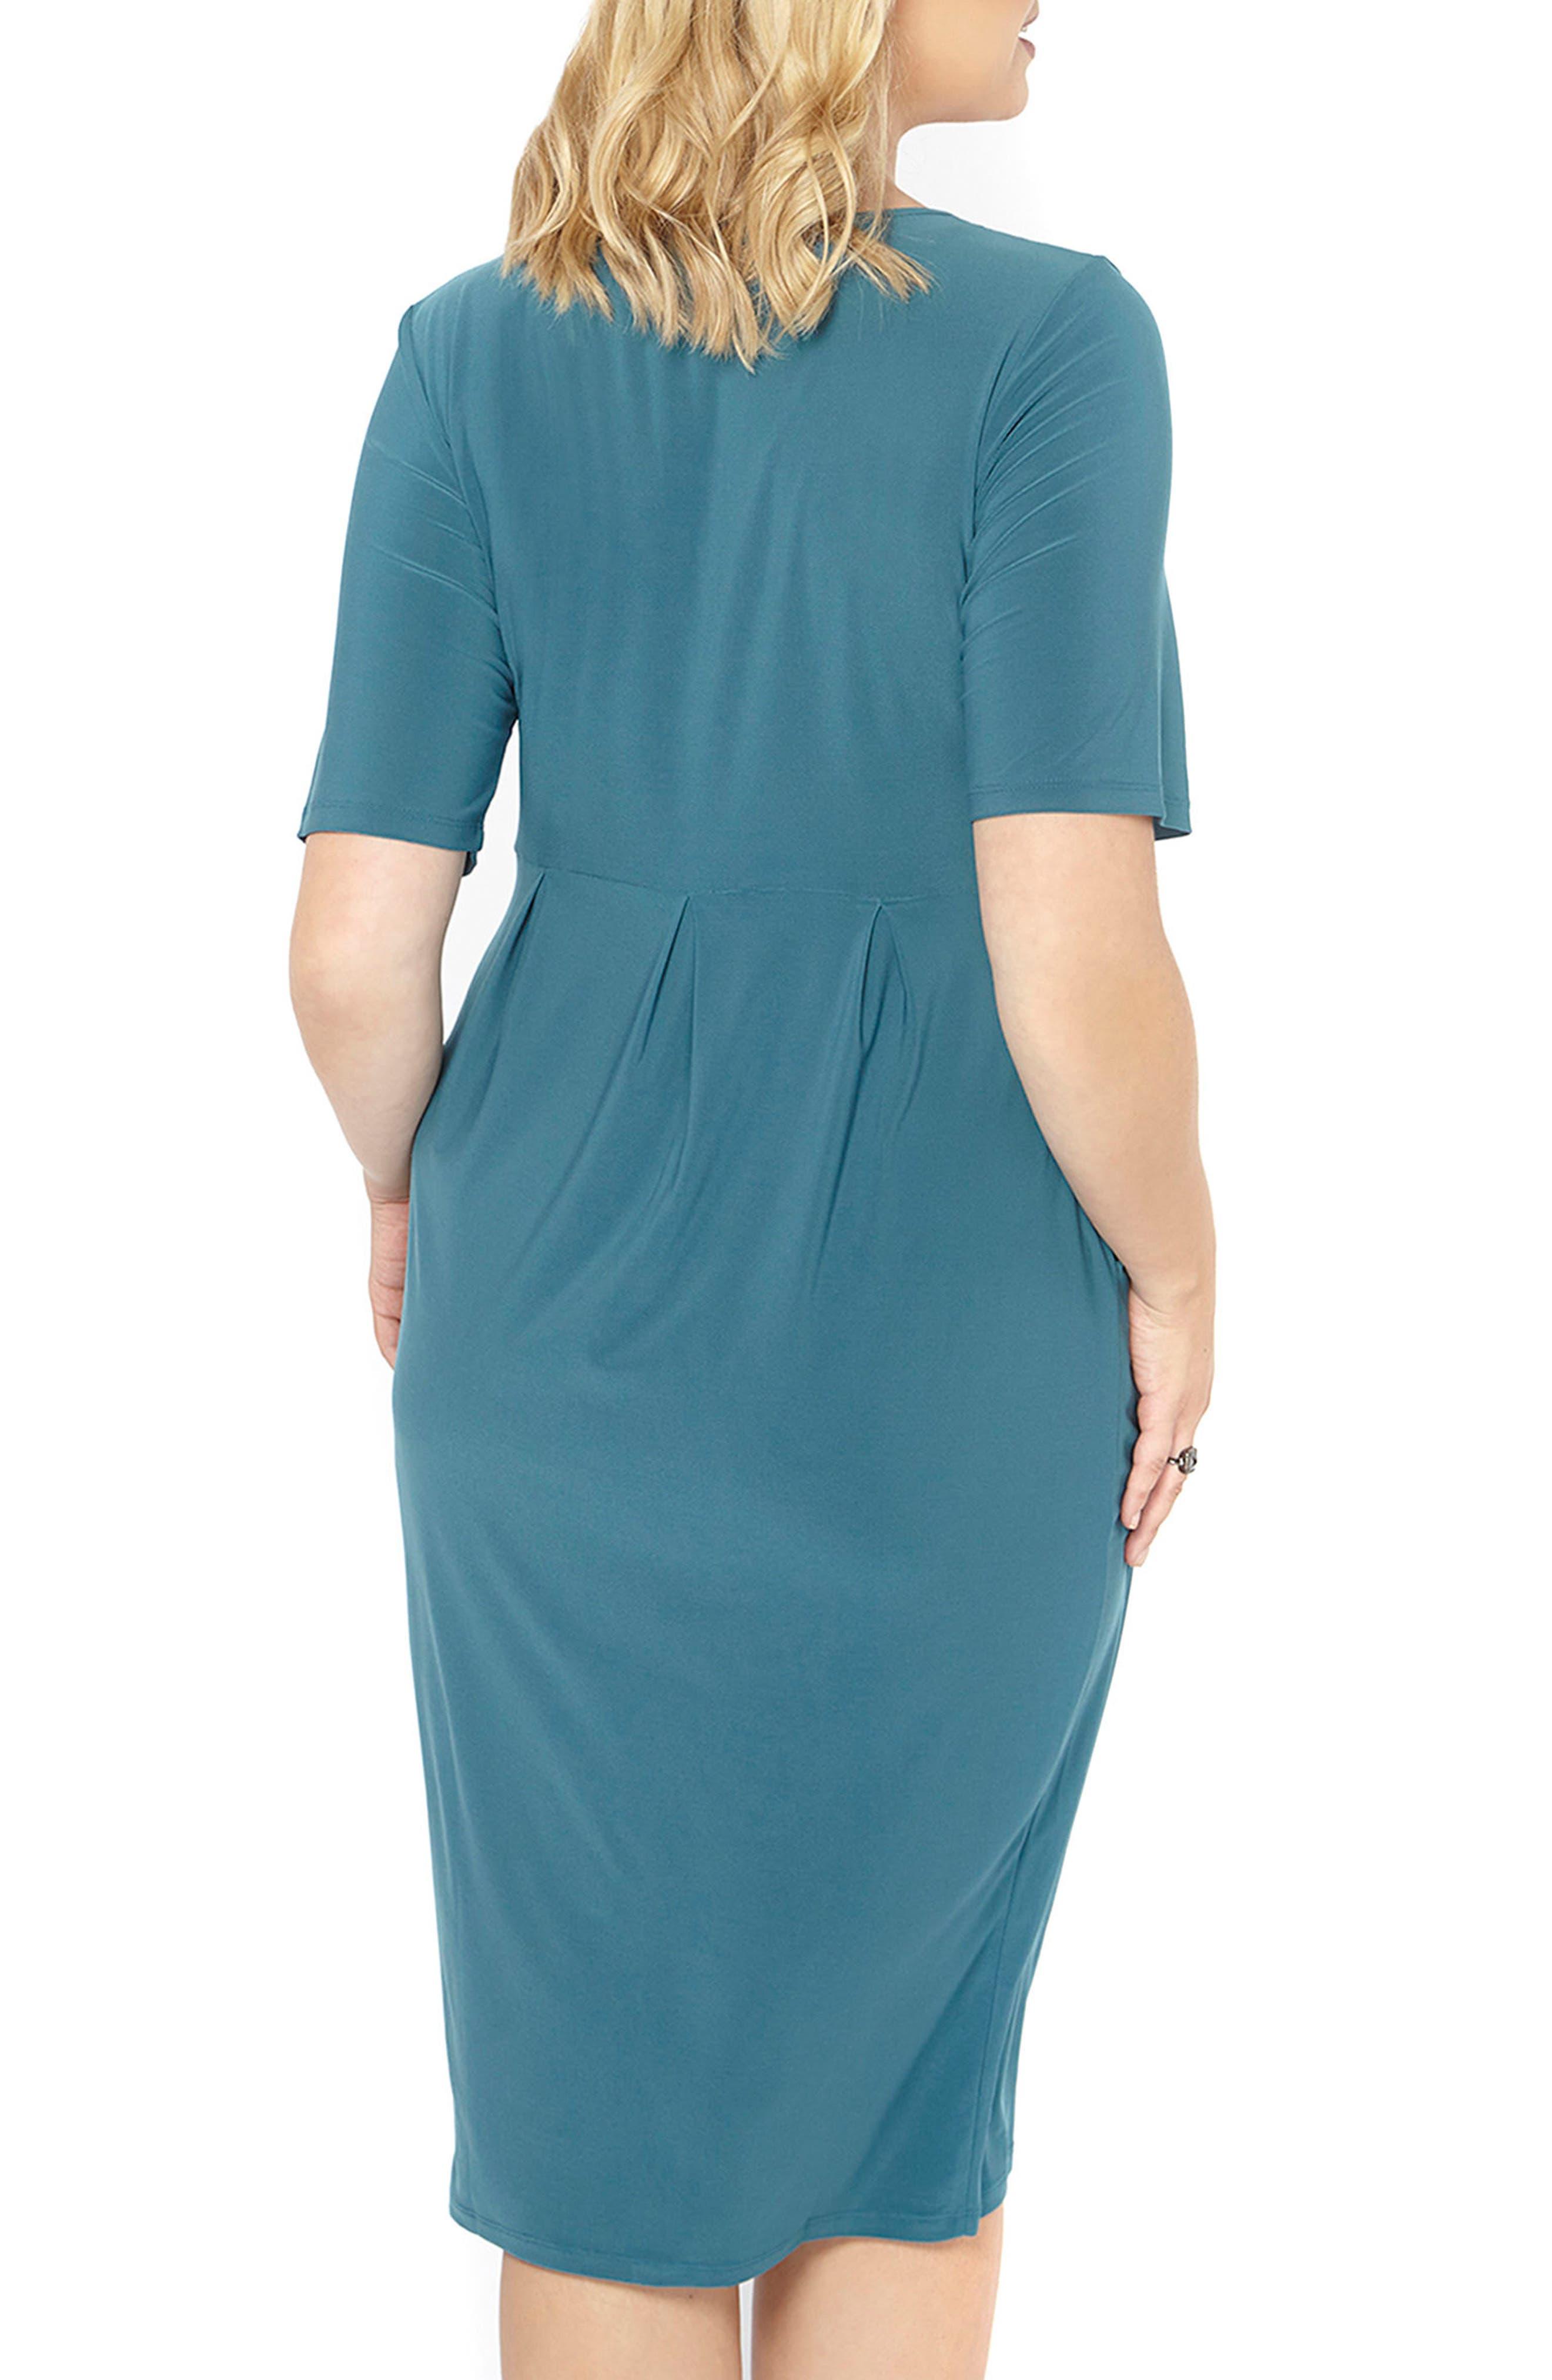 Pocket Dress,                             Alternate thumbnail 2, color,                             300